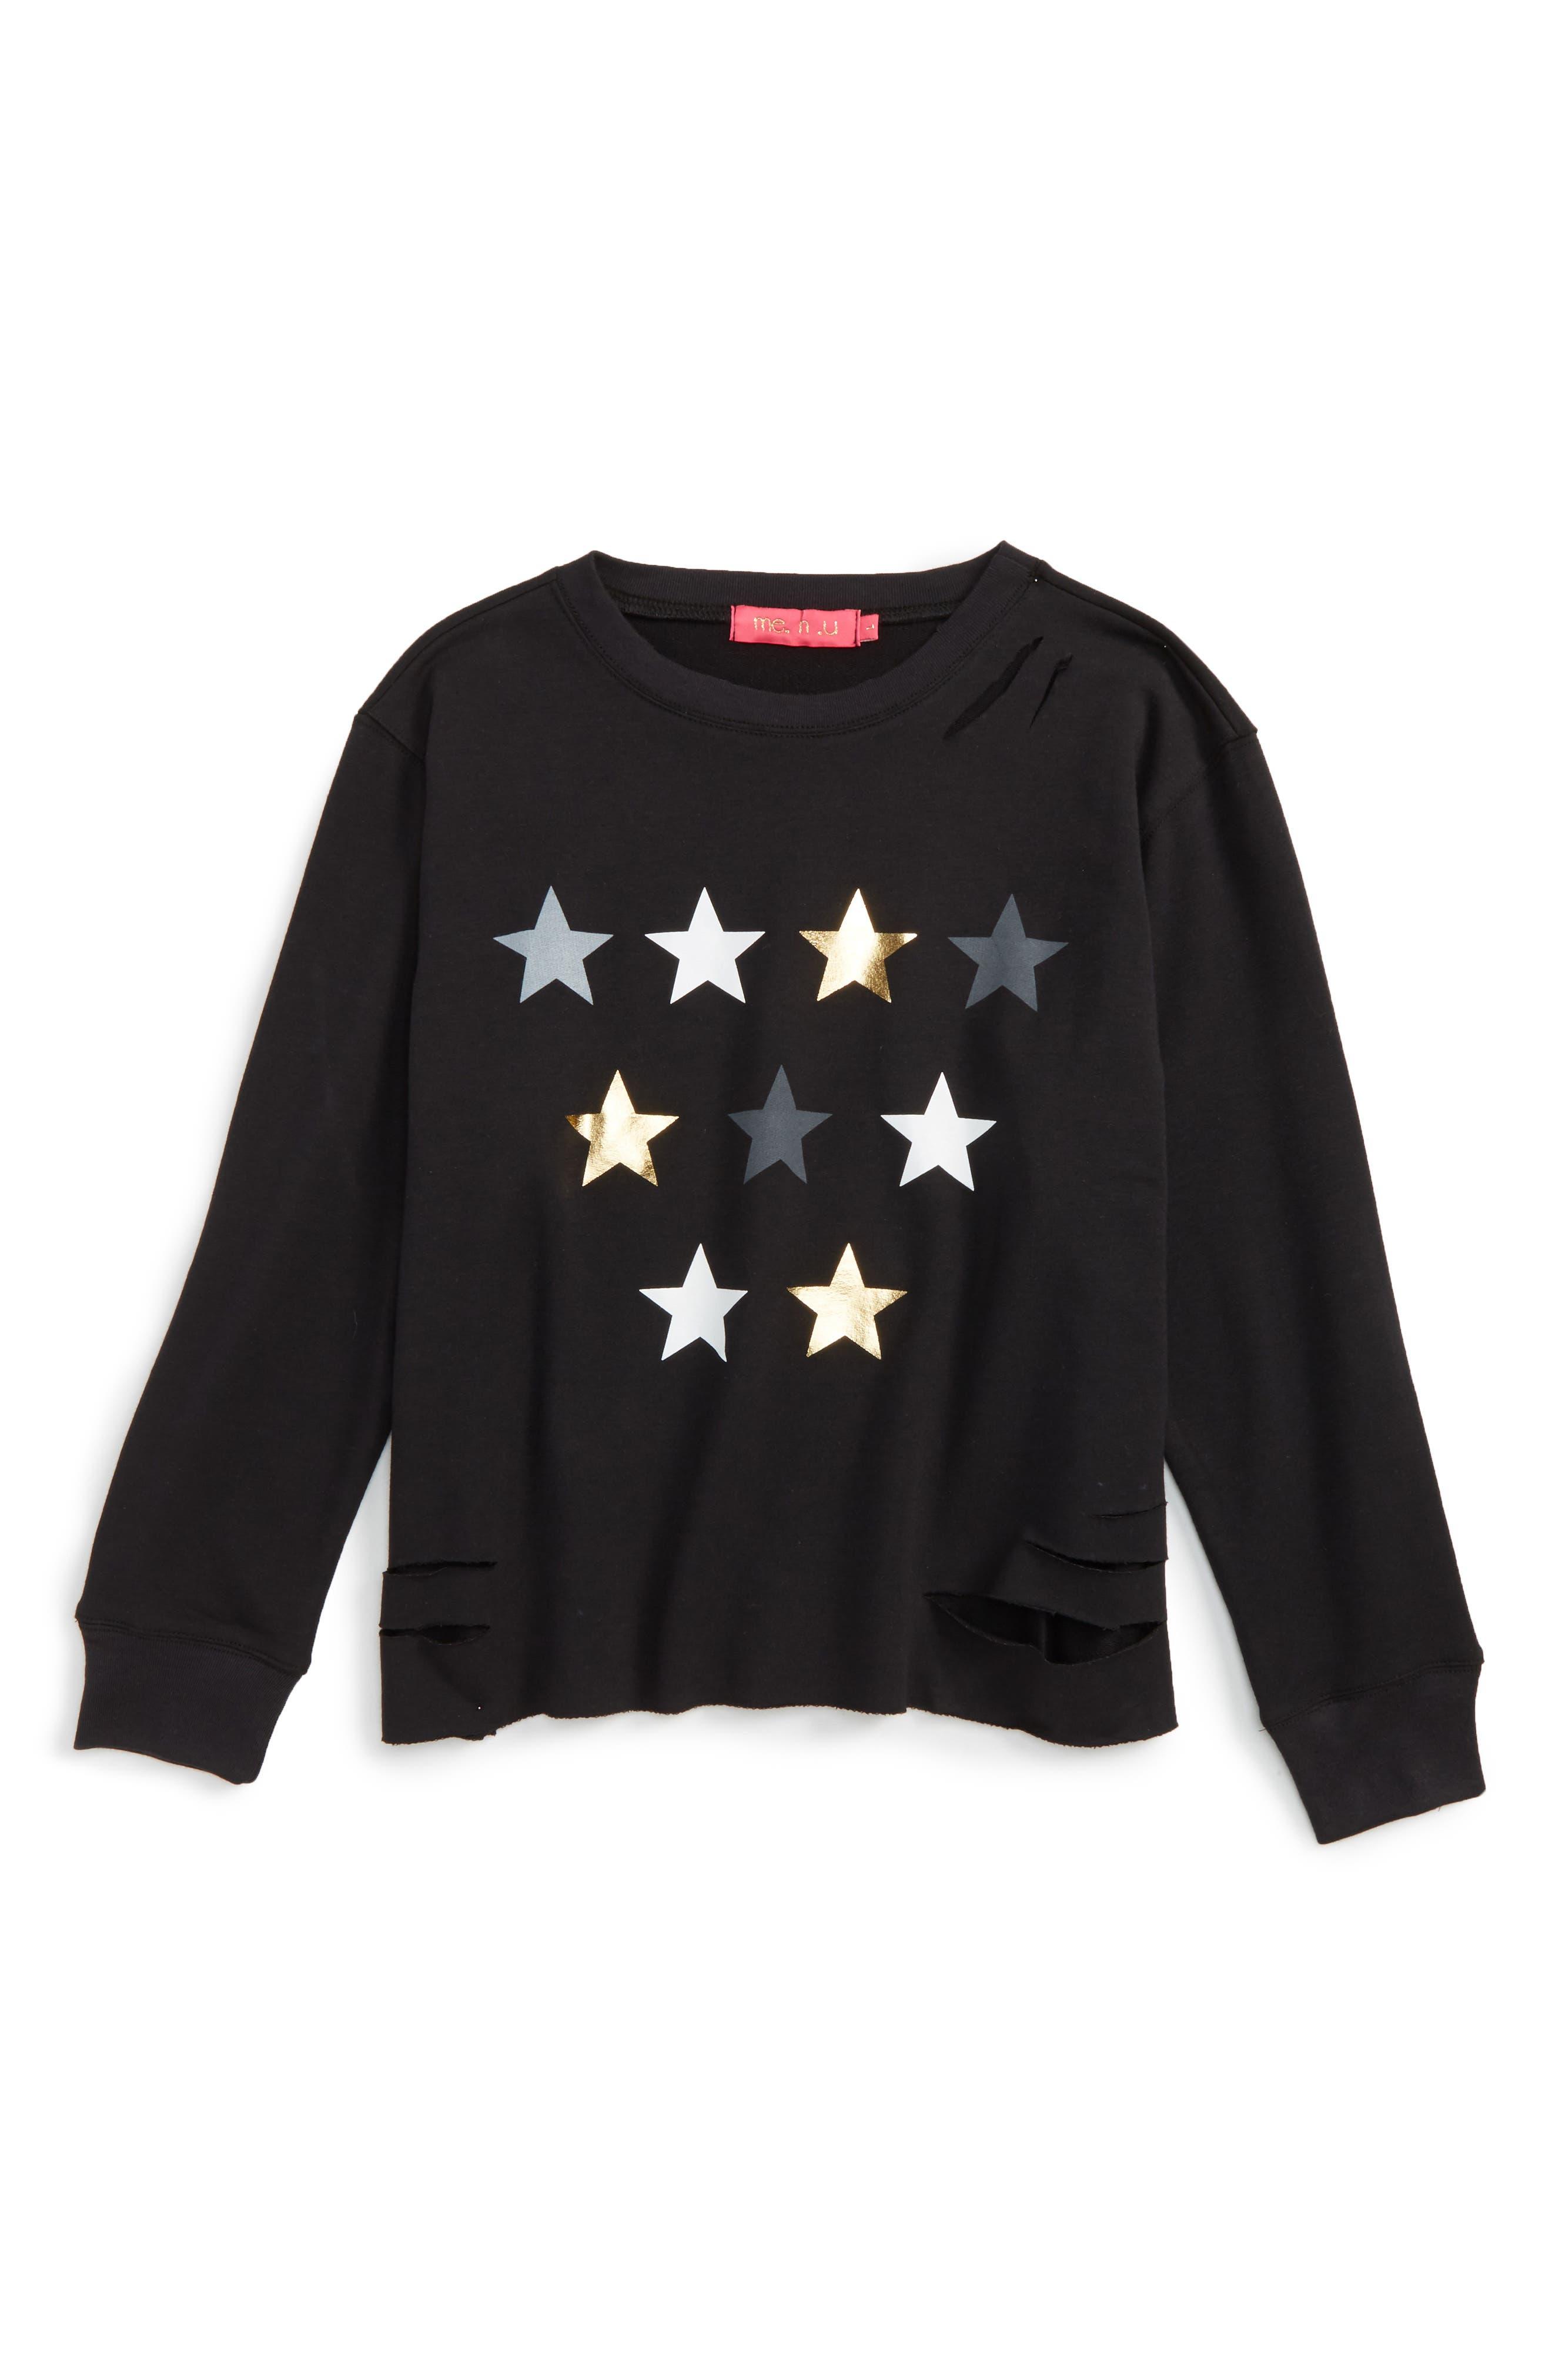 Alternate Image 1 Selected - me.n.u Star Graphic Destructed Sweatshirt (Big Girls)